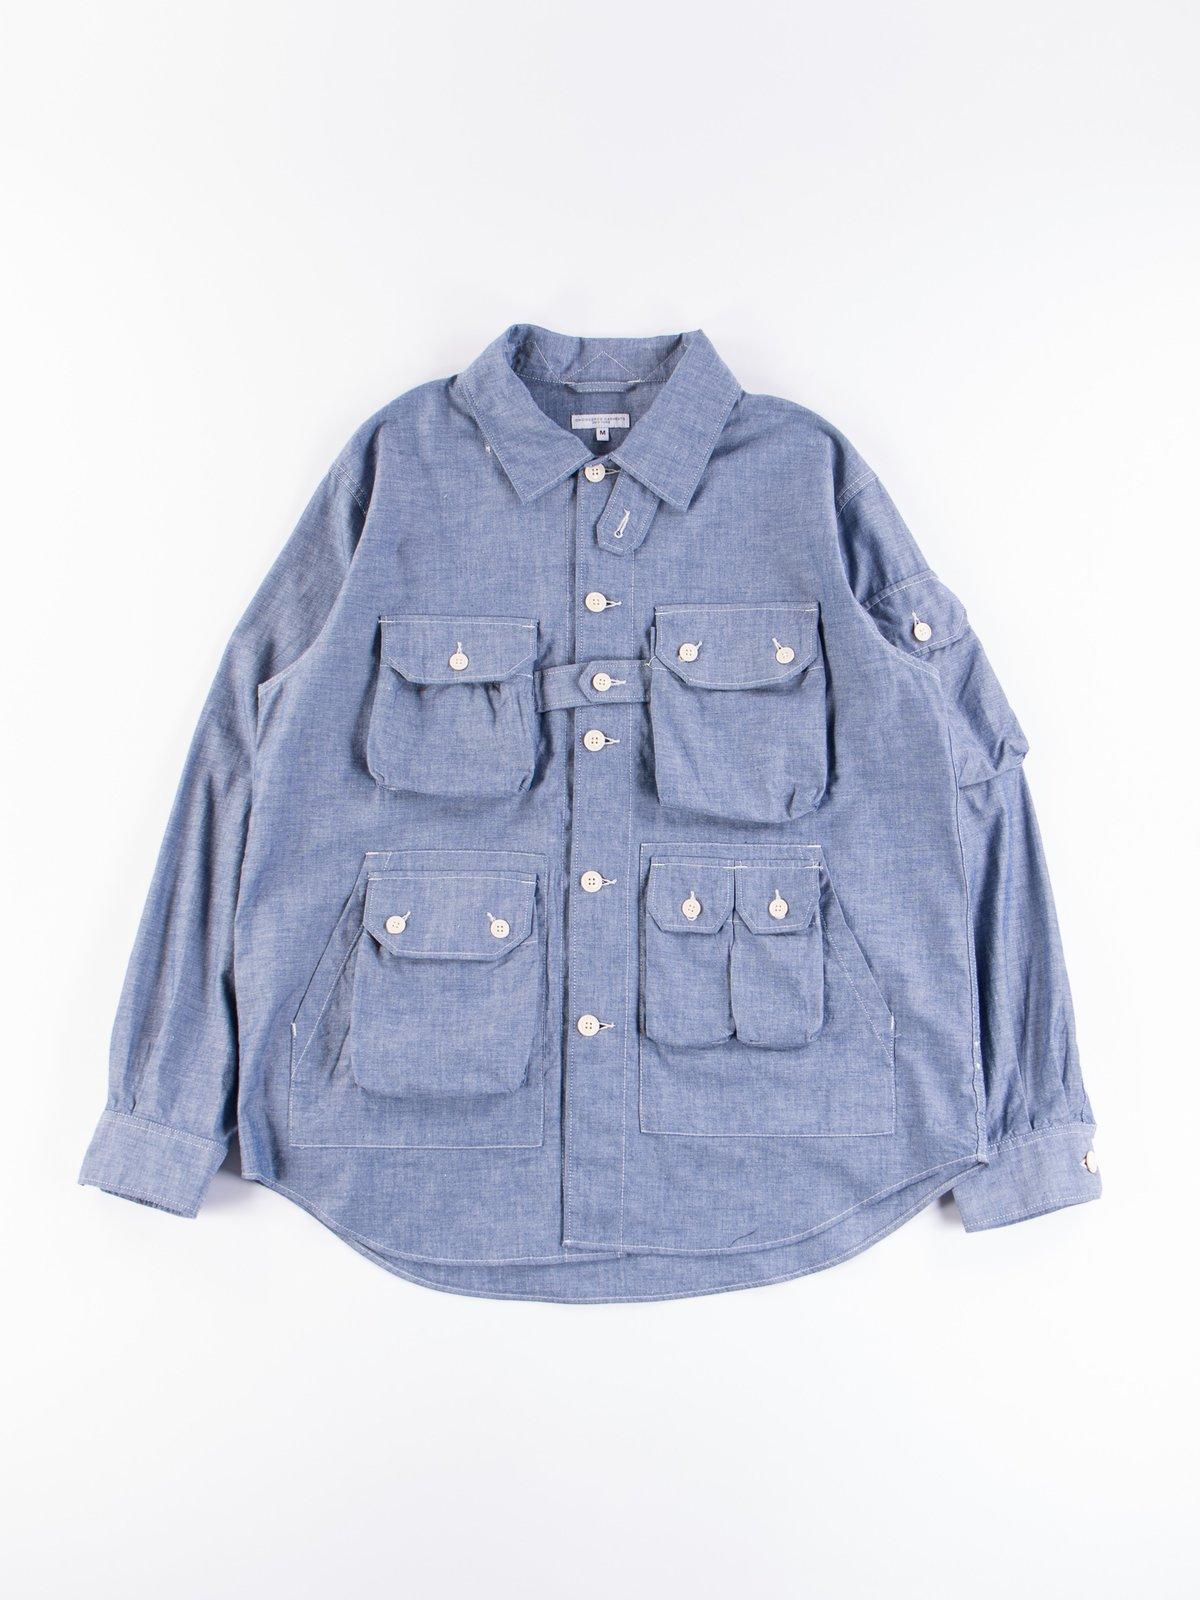 Blue Cotton Chambray Explorer Shirt Jacket - Image 1